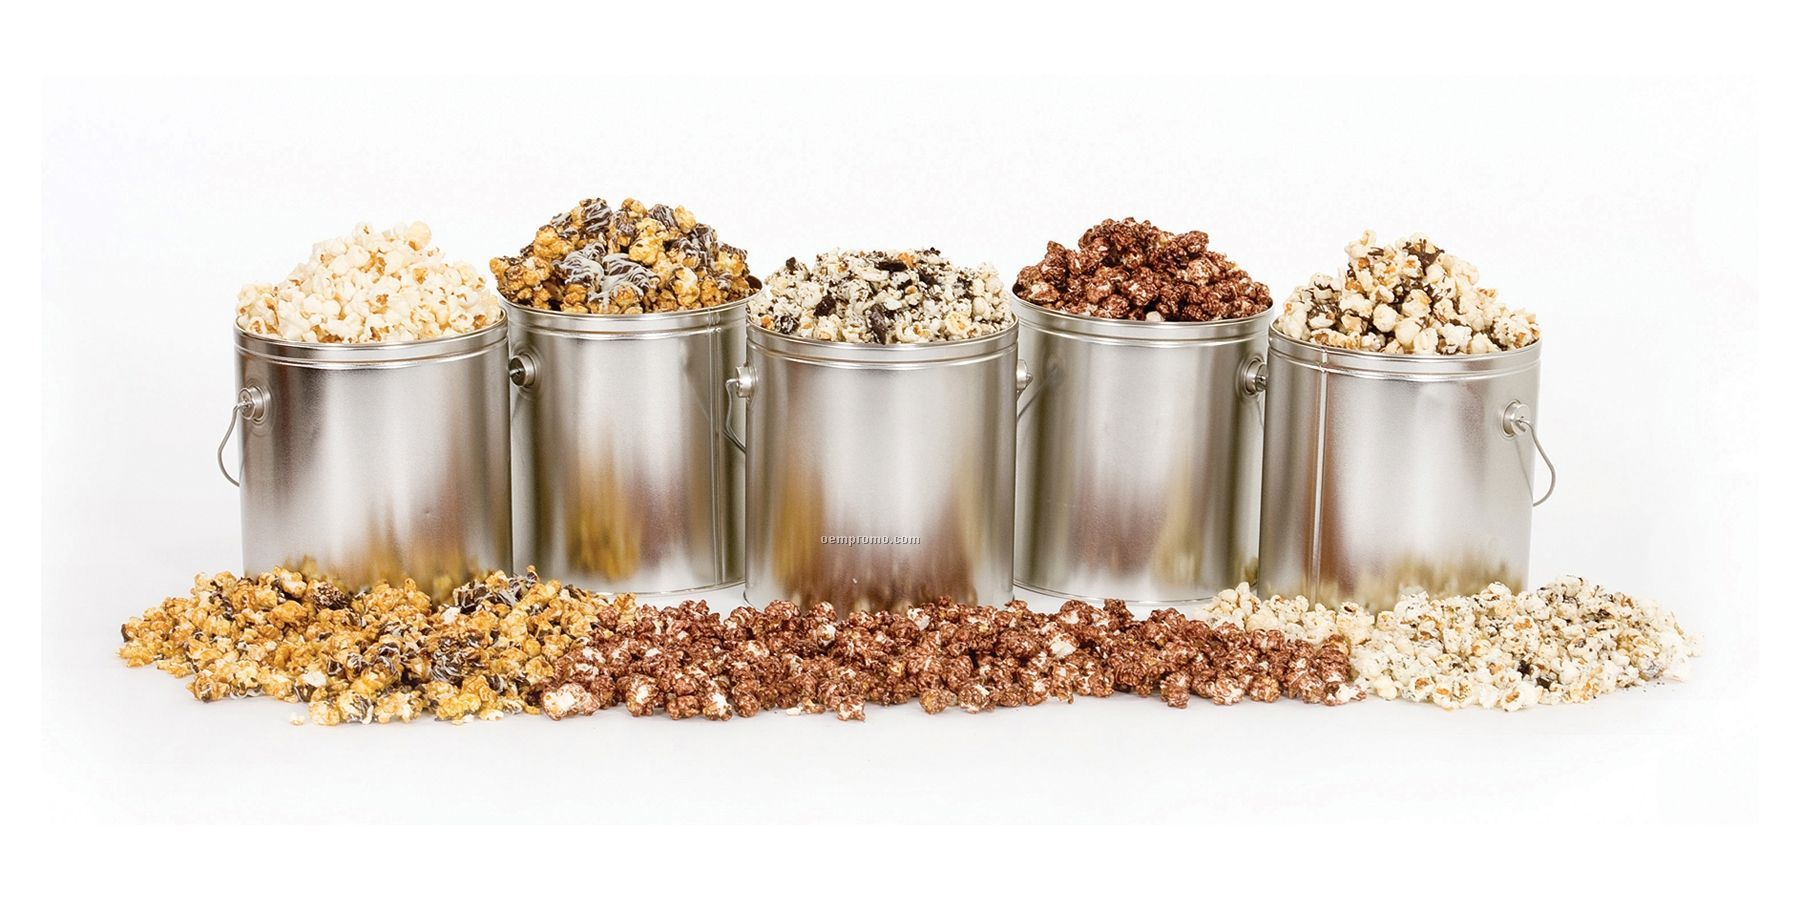 6 1/2 Gallon S'mores Flavored Kettle Corn